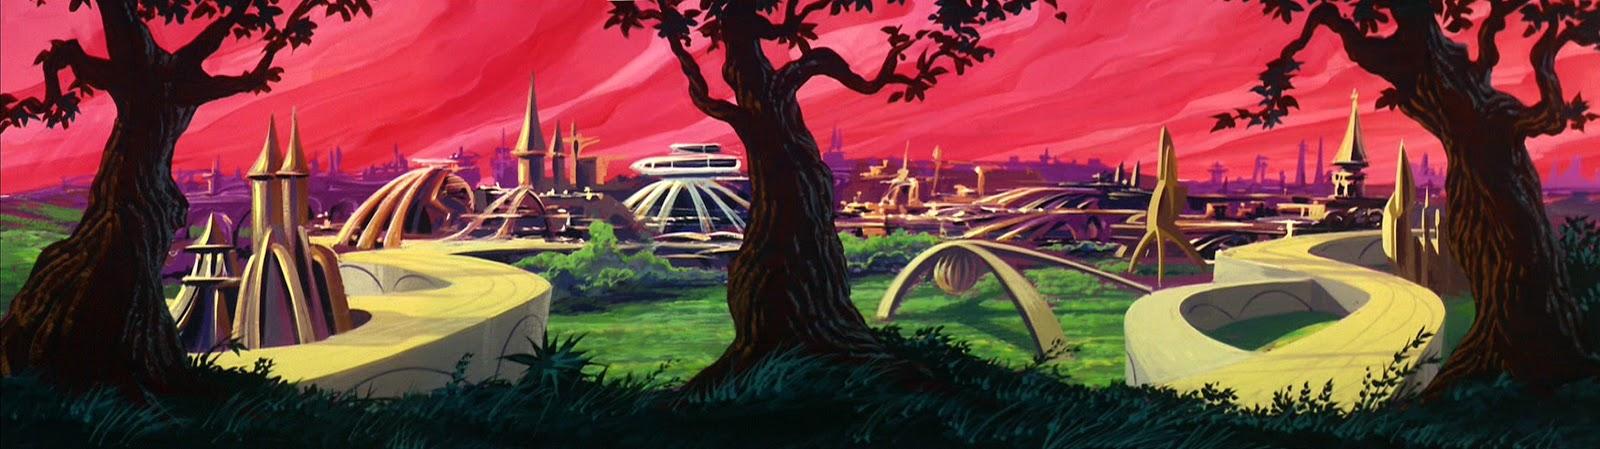 Star Trek Wallpaper